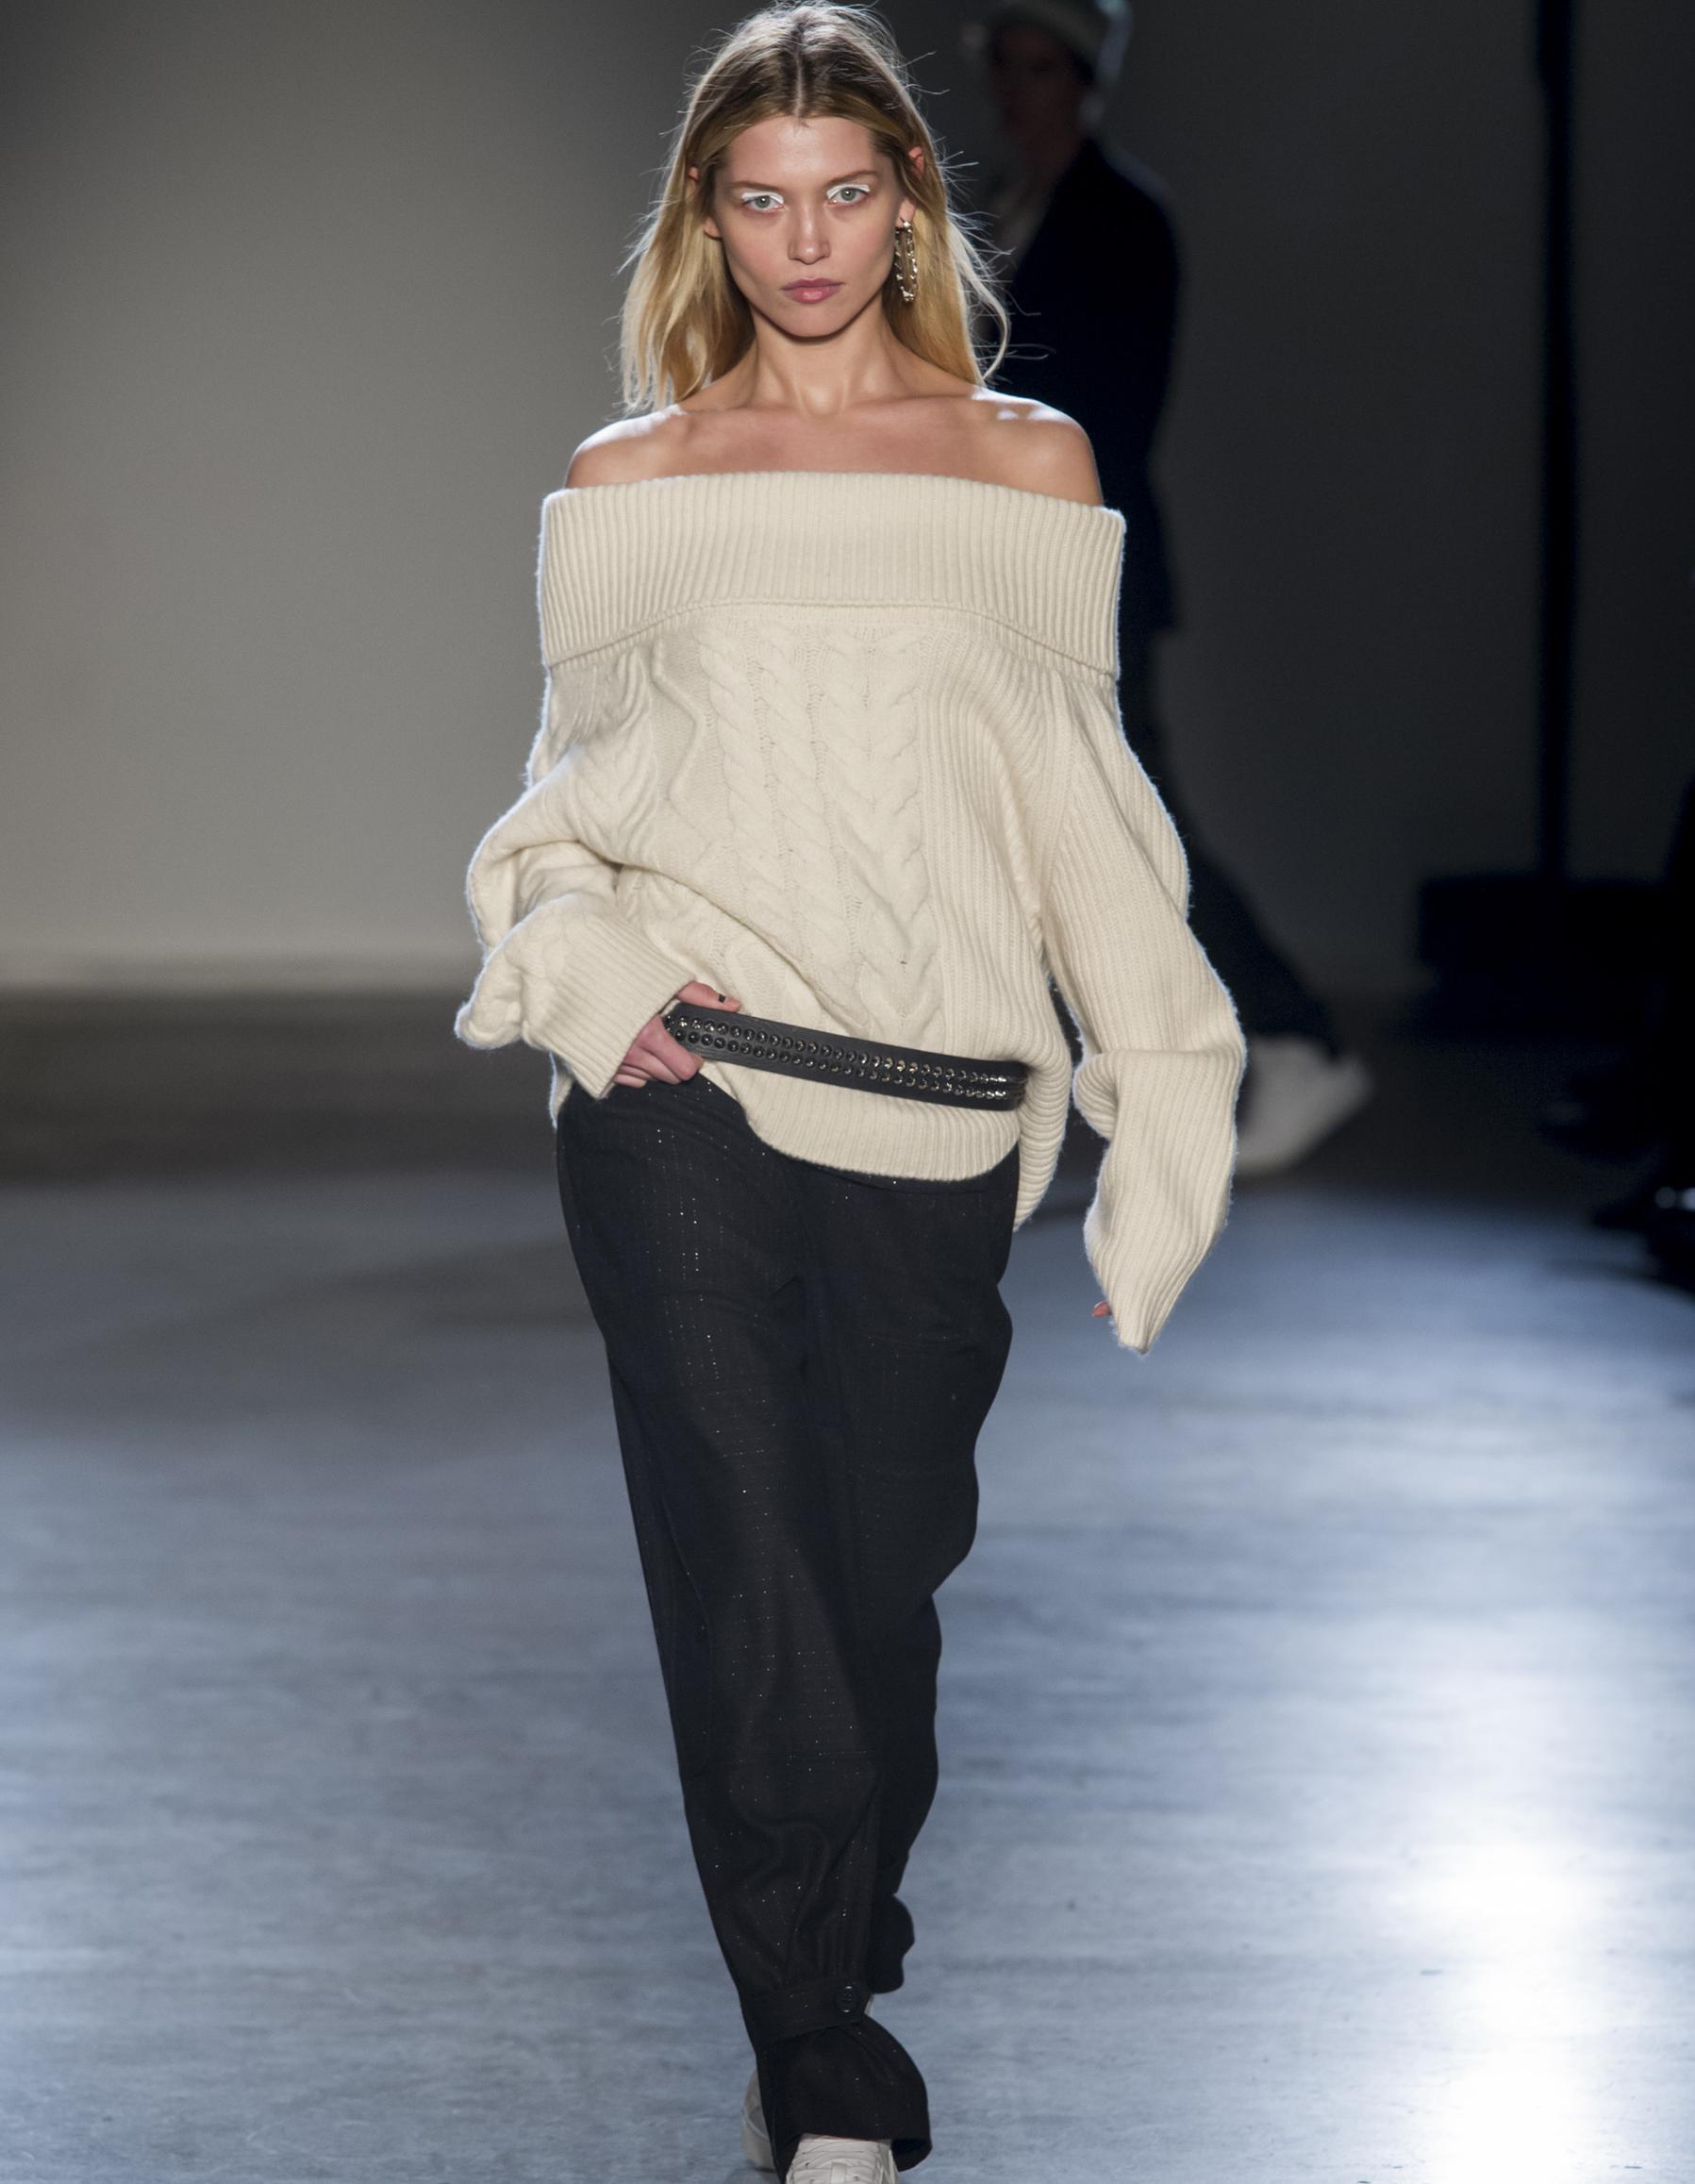 Tendance mode automne 2018 pret a porter